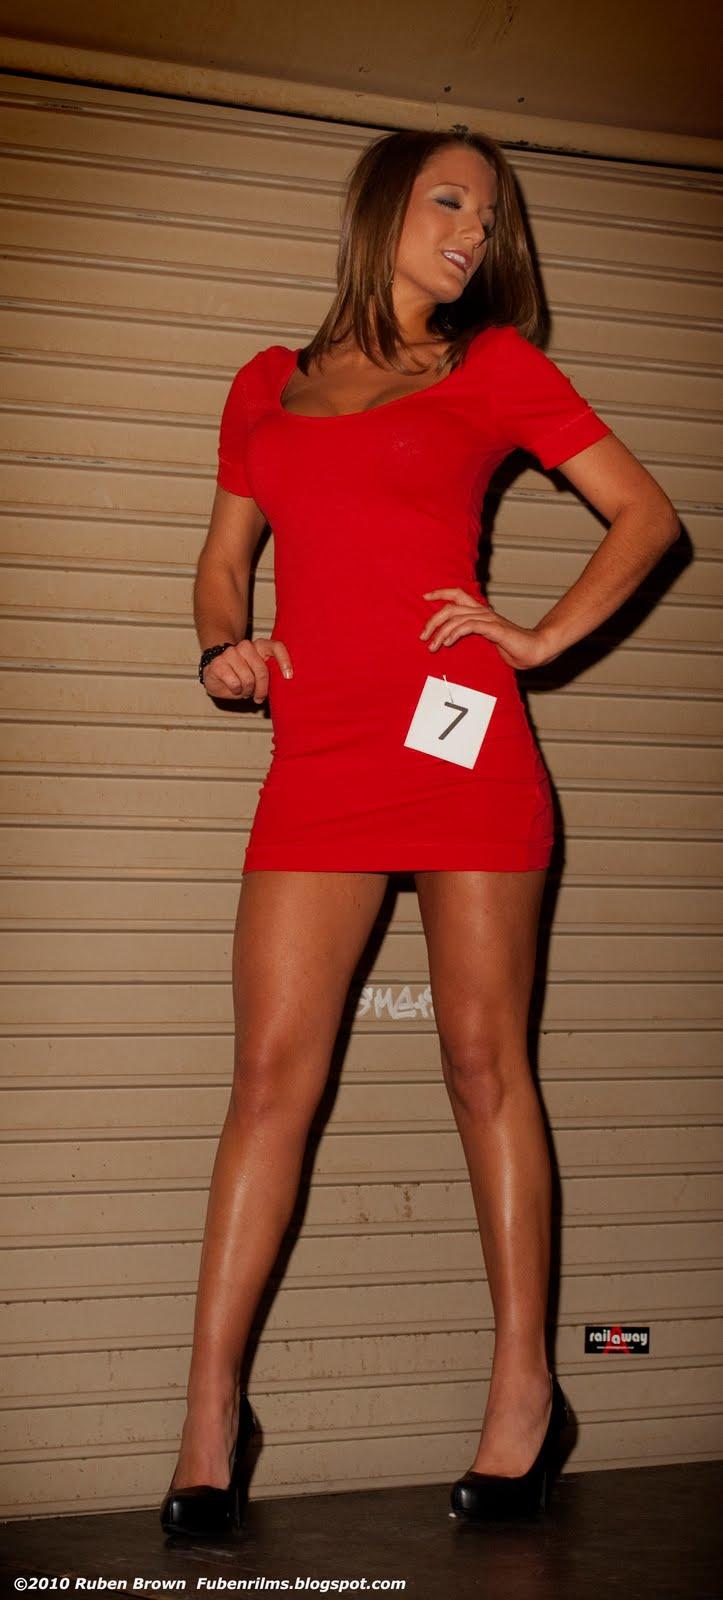 DSC 1009 Florida Slamfest Bikini Contest Contestants Photo 19